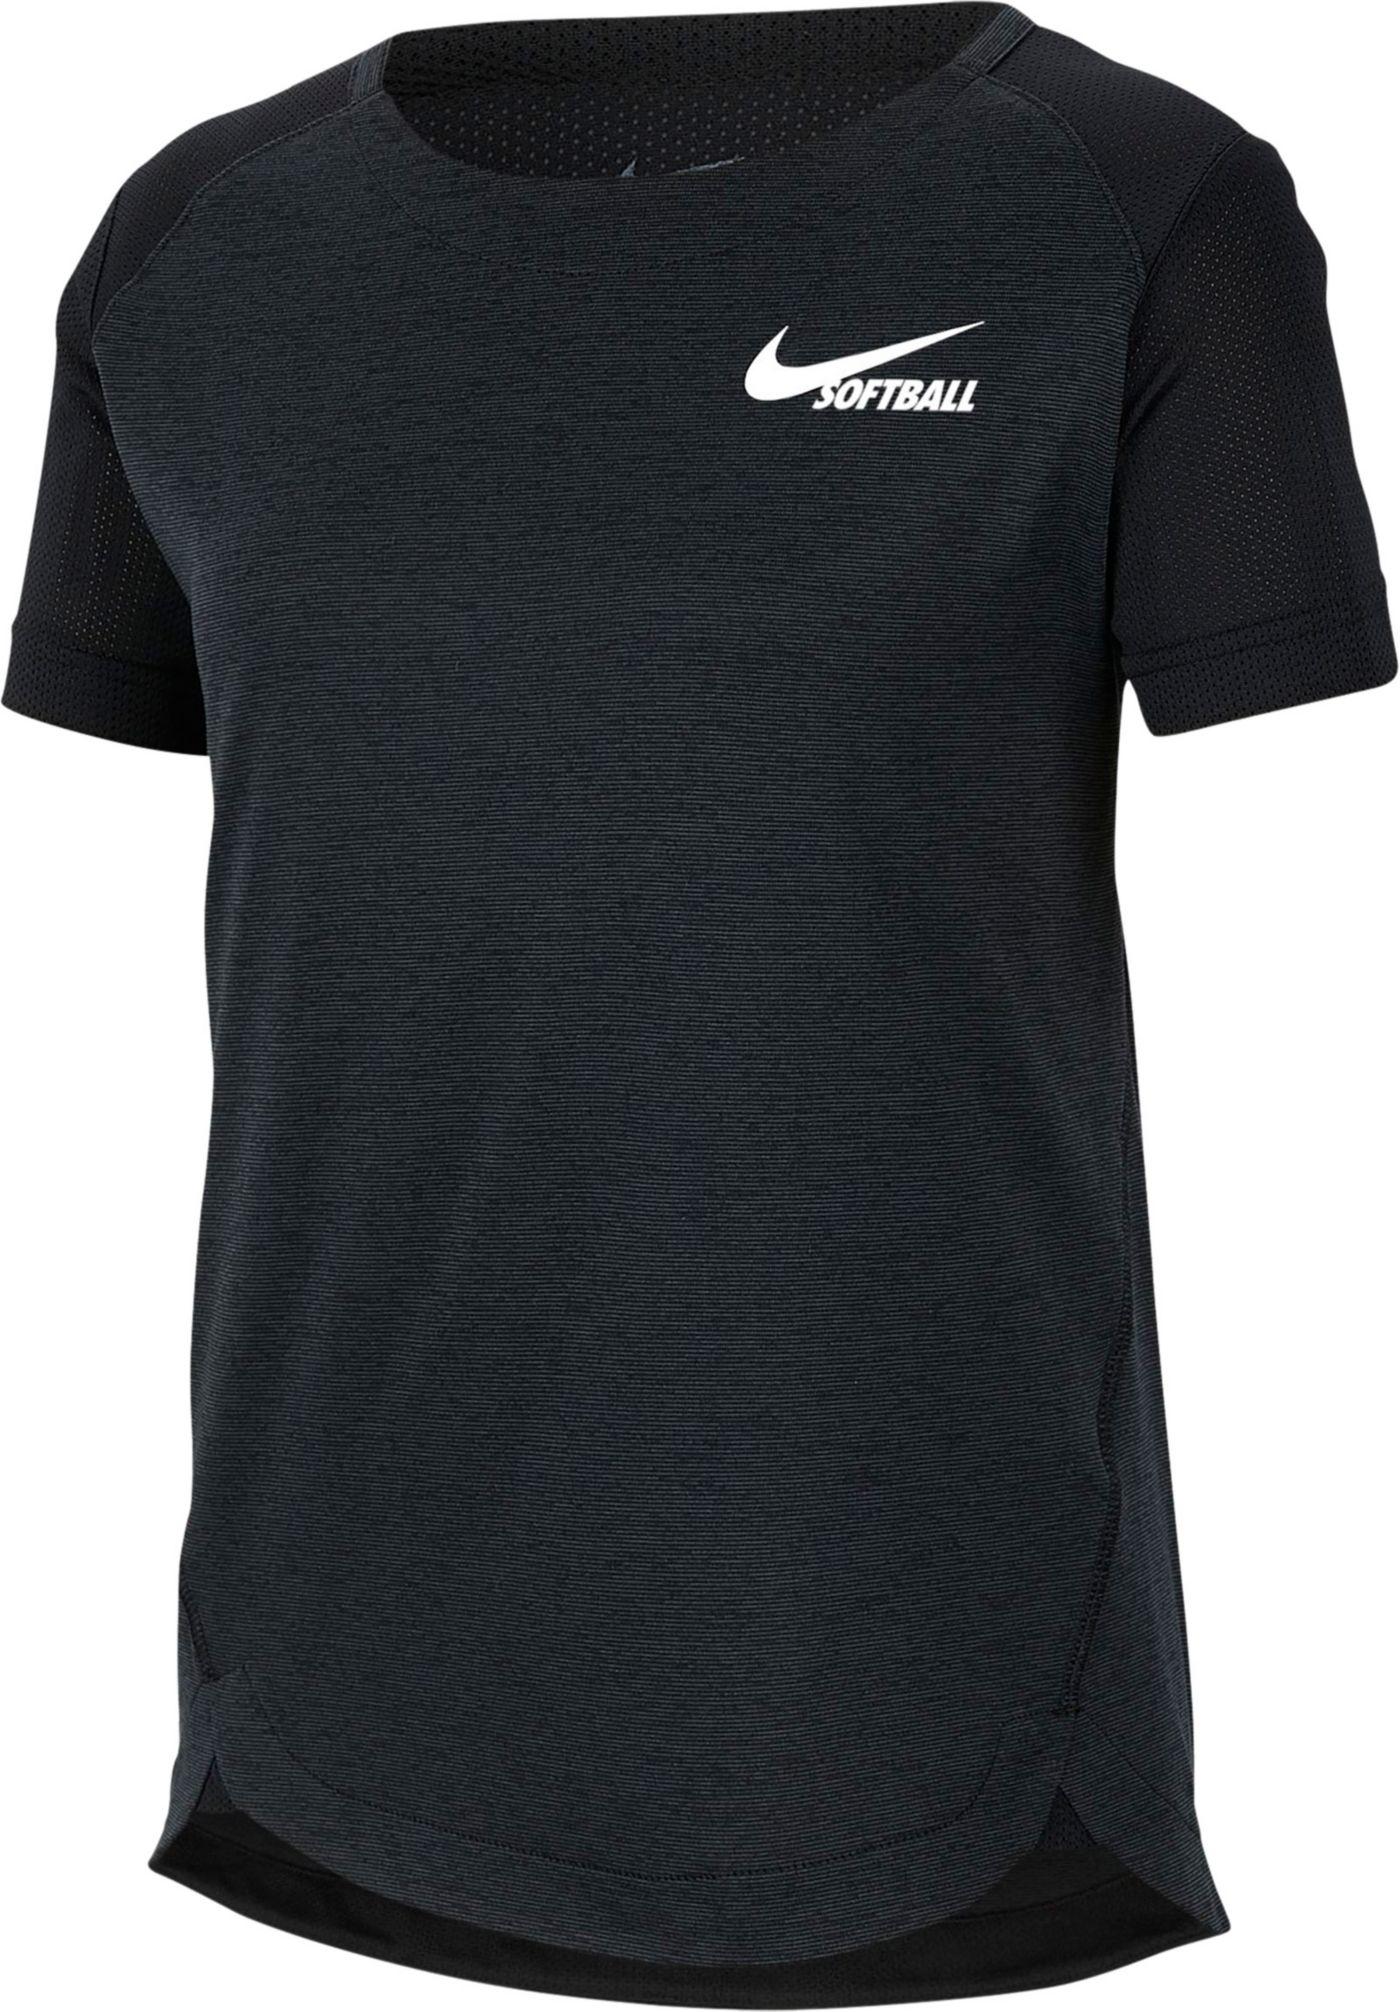 Nike Girls' Dri-FIT Short-Sleeve Softball Top